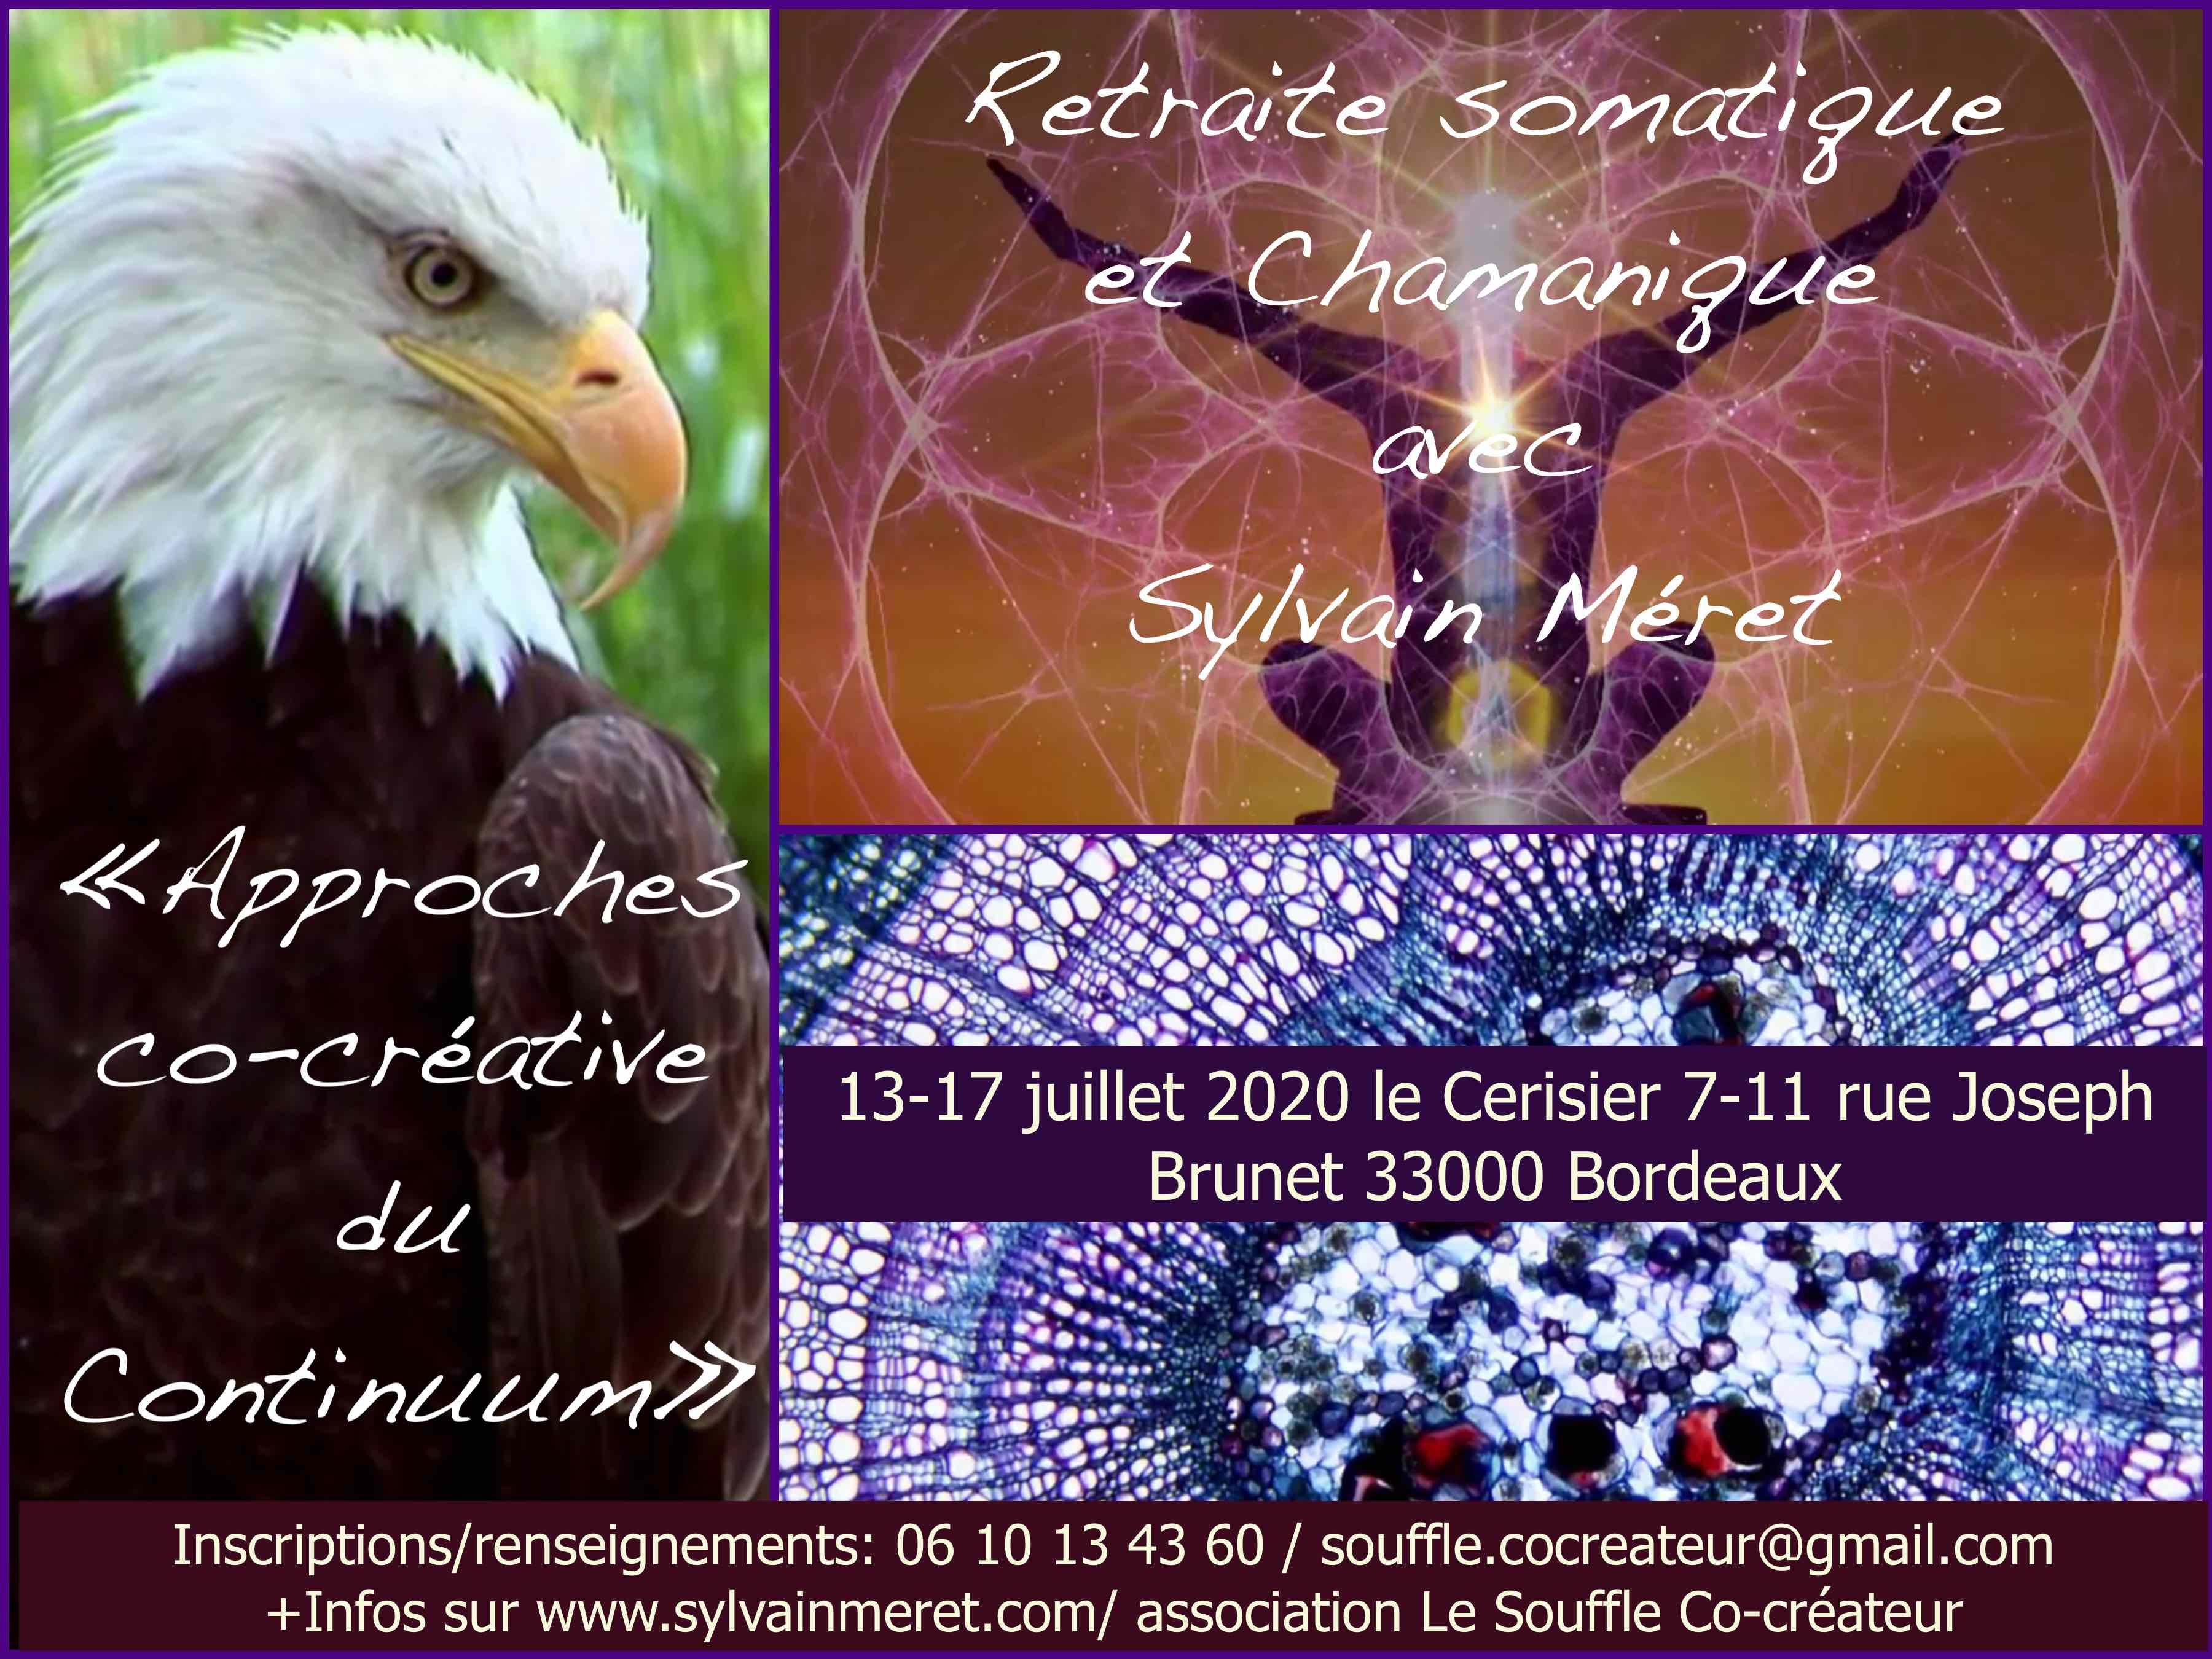 cocreative continuum juillet 2020 flyer